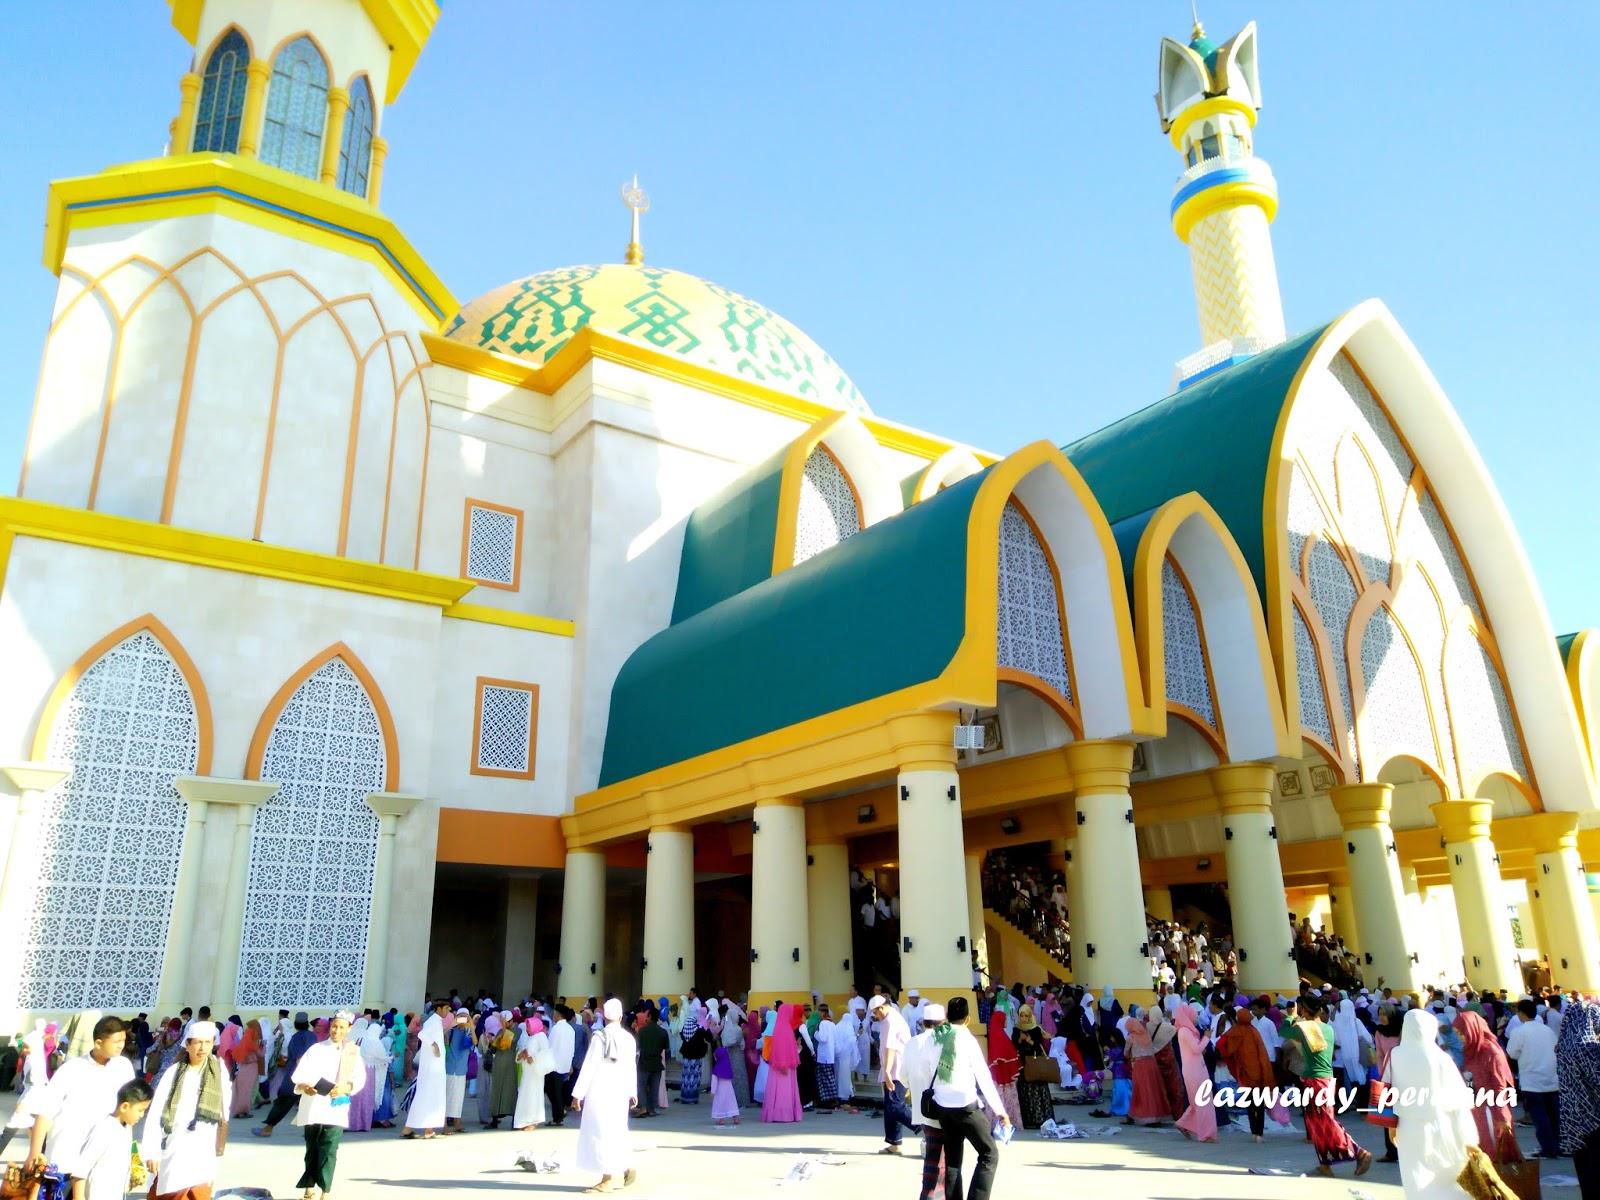 Peresmian Islamic Center Lombok Landmark Kota Mataram Lazwardy Sekitar Jam